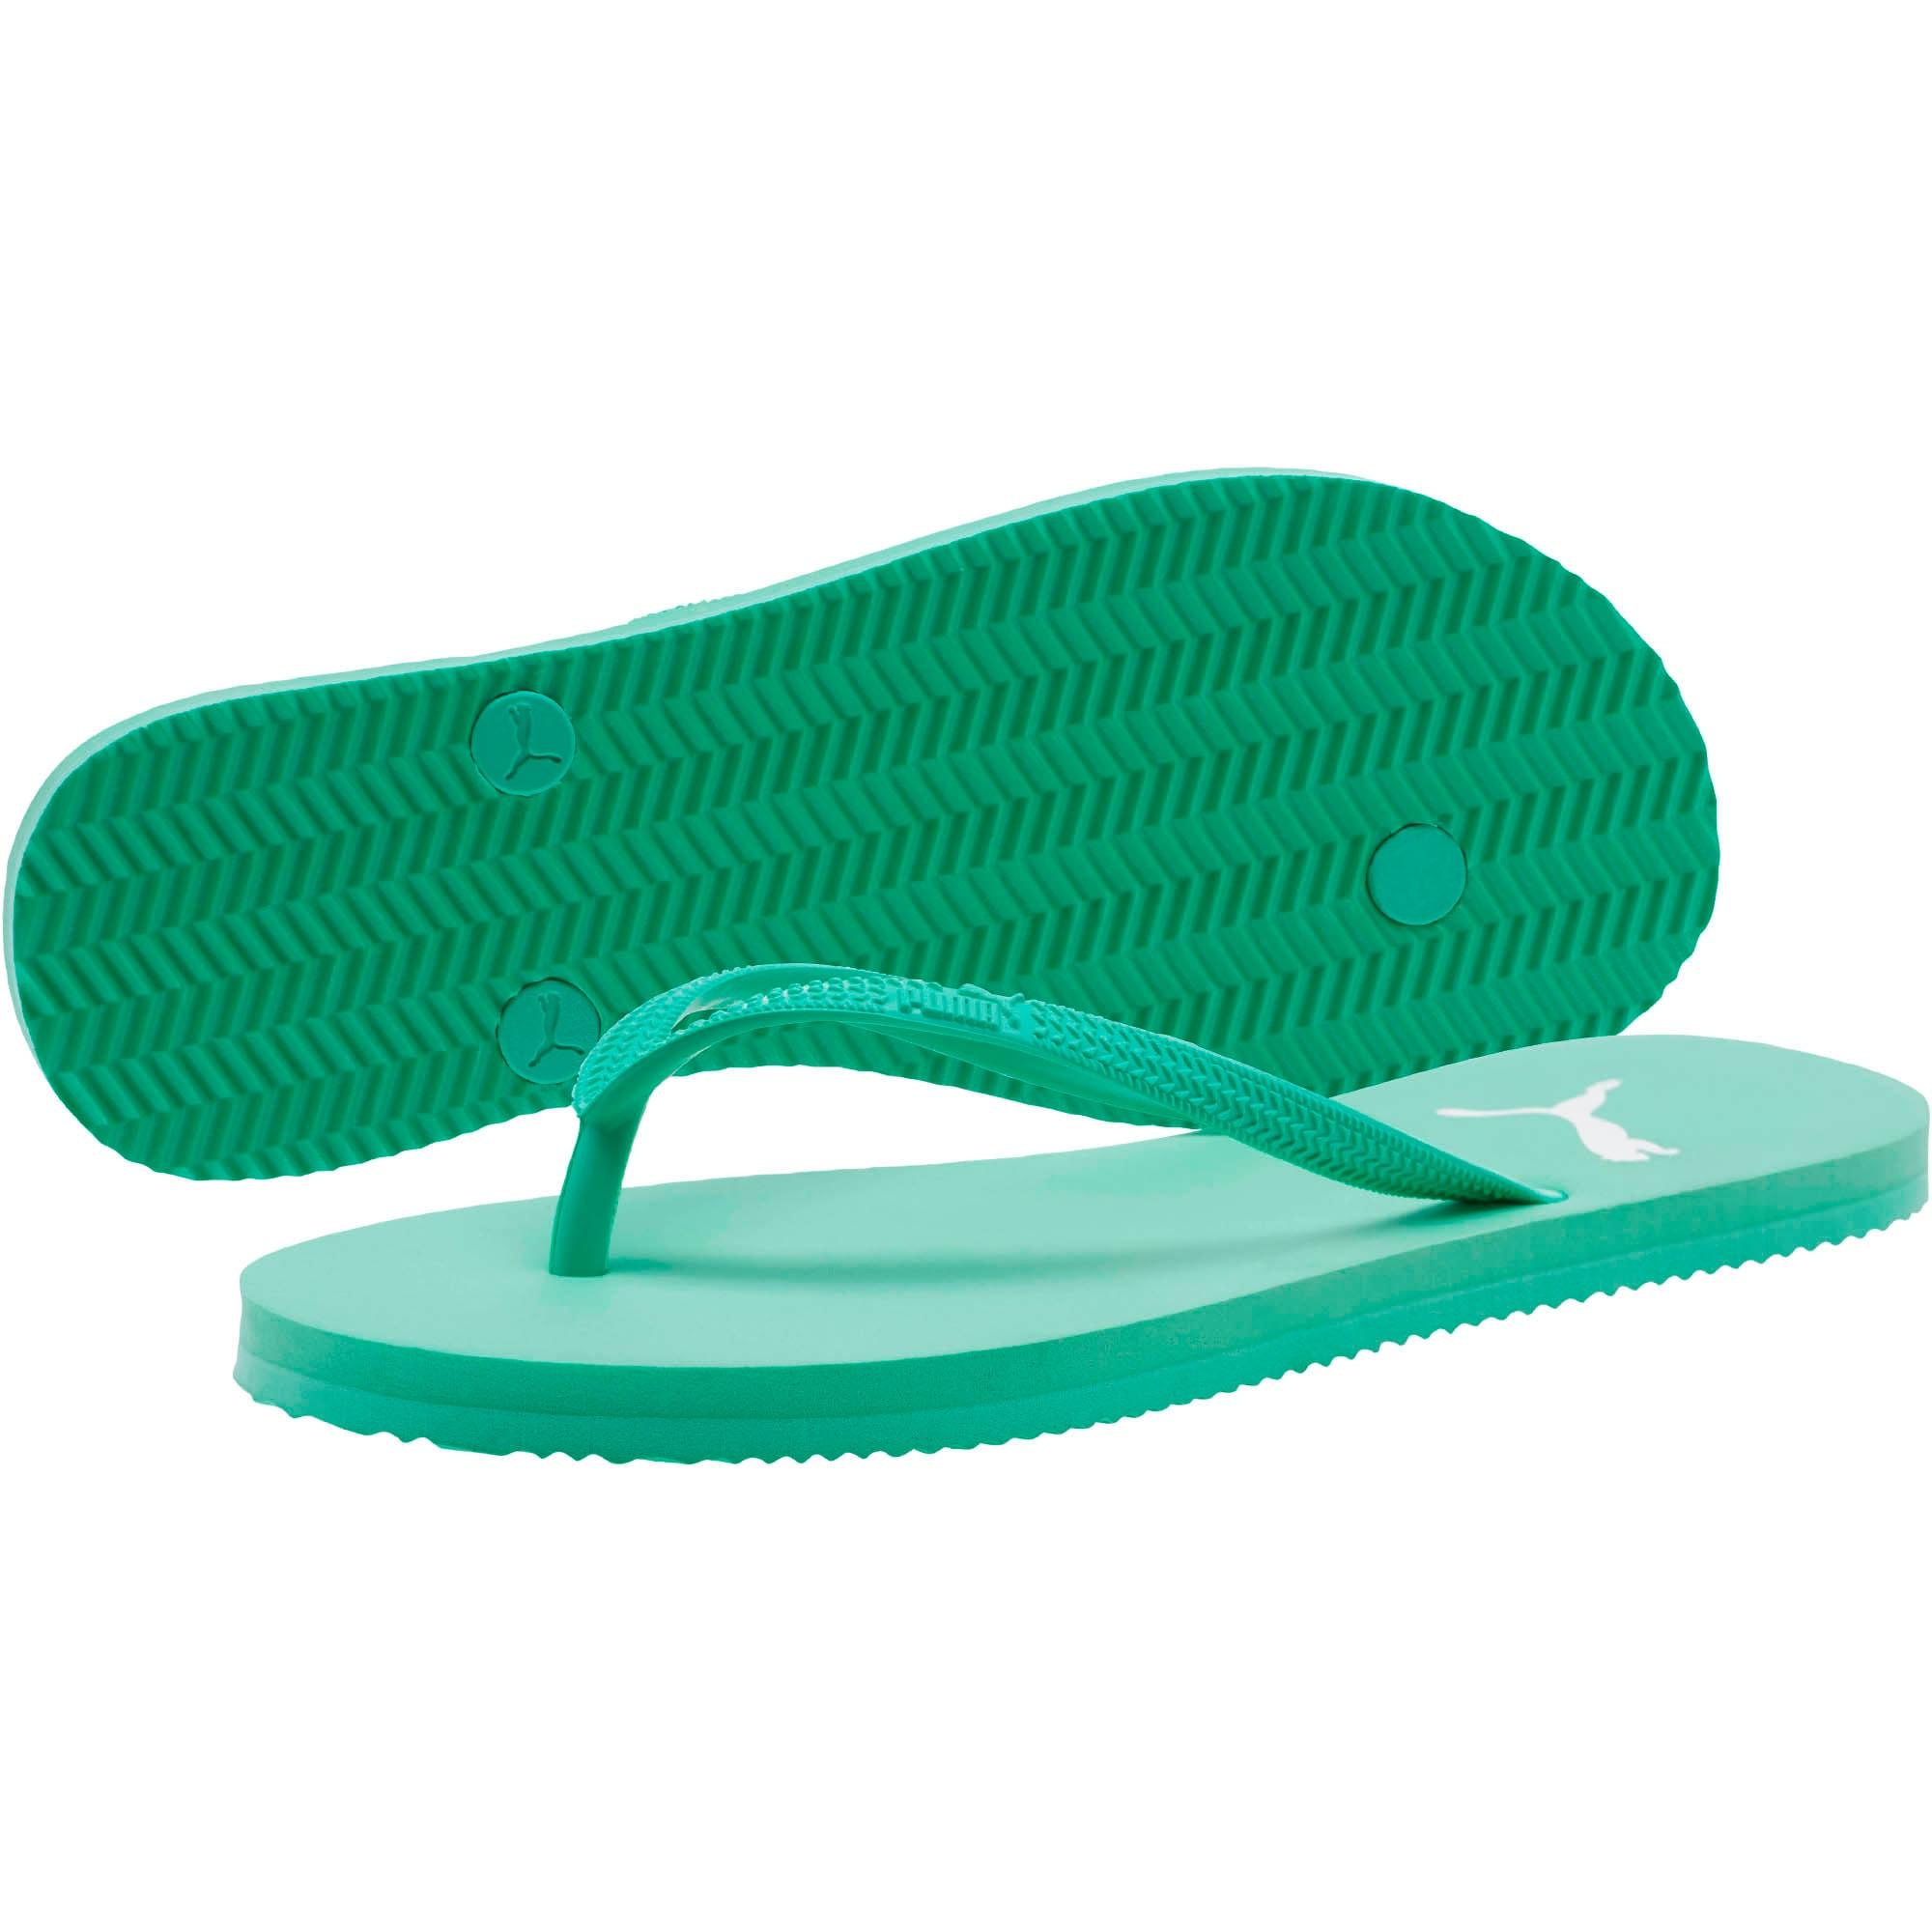 Thumbnail 2 of First Flip Women's Sandals, Biscay Green-Puma White, medium